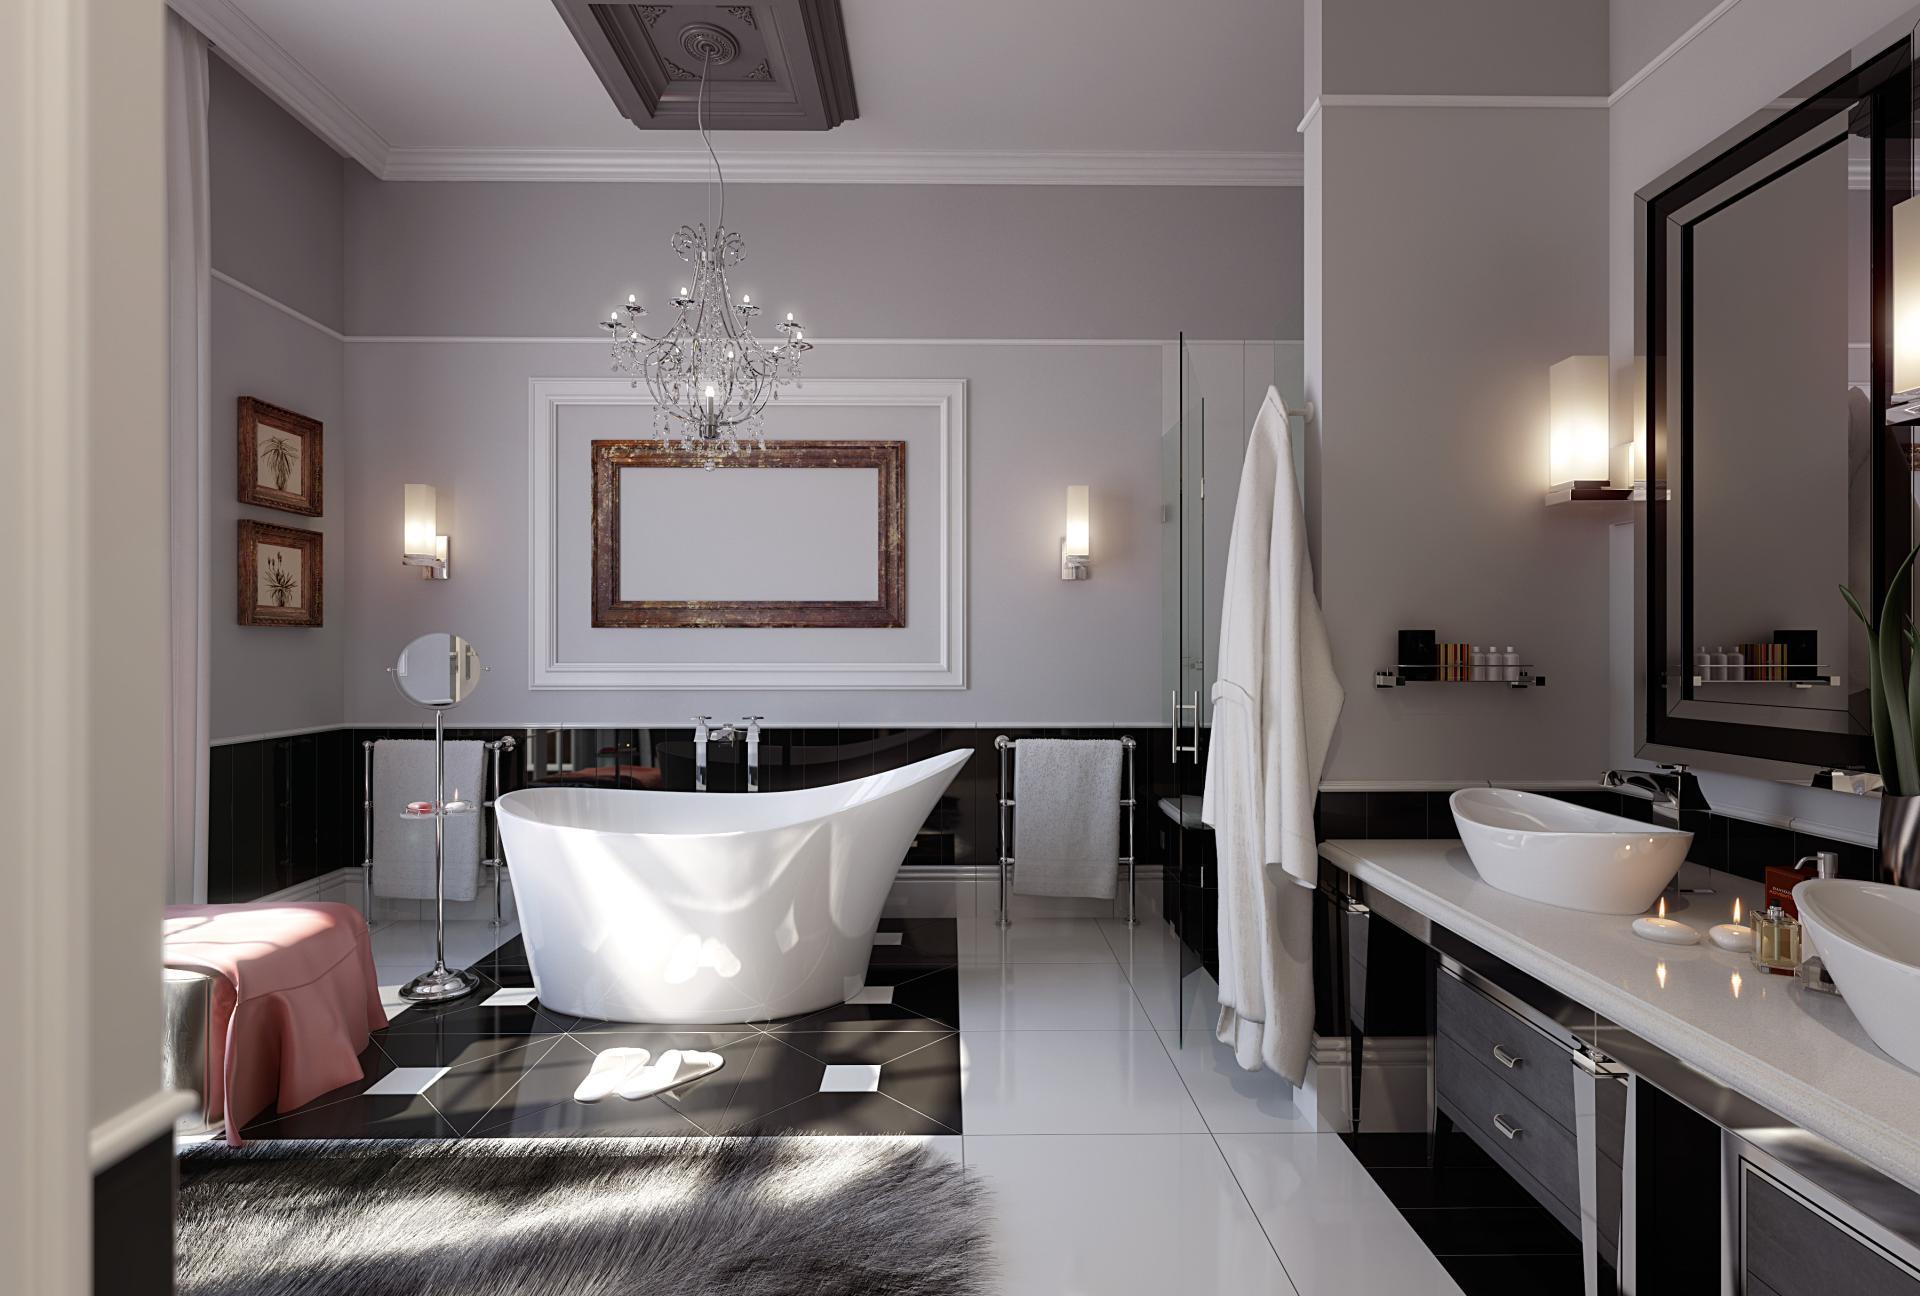 дизайн ванной комнаты 2015 фото новинки #11